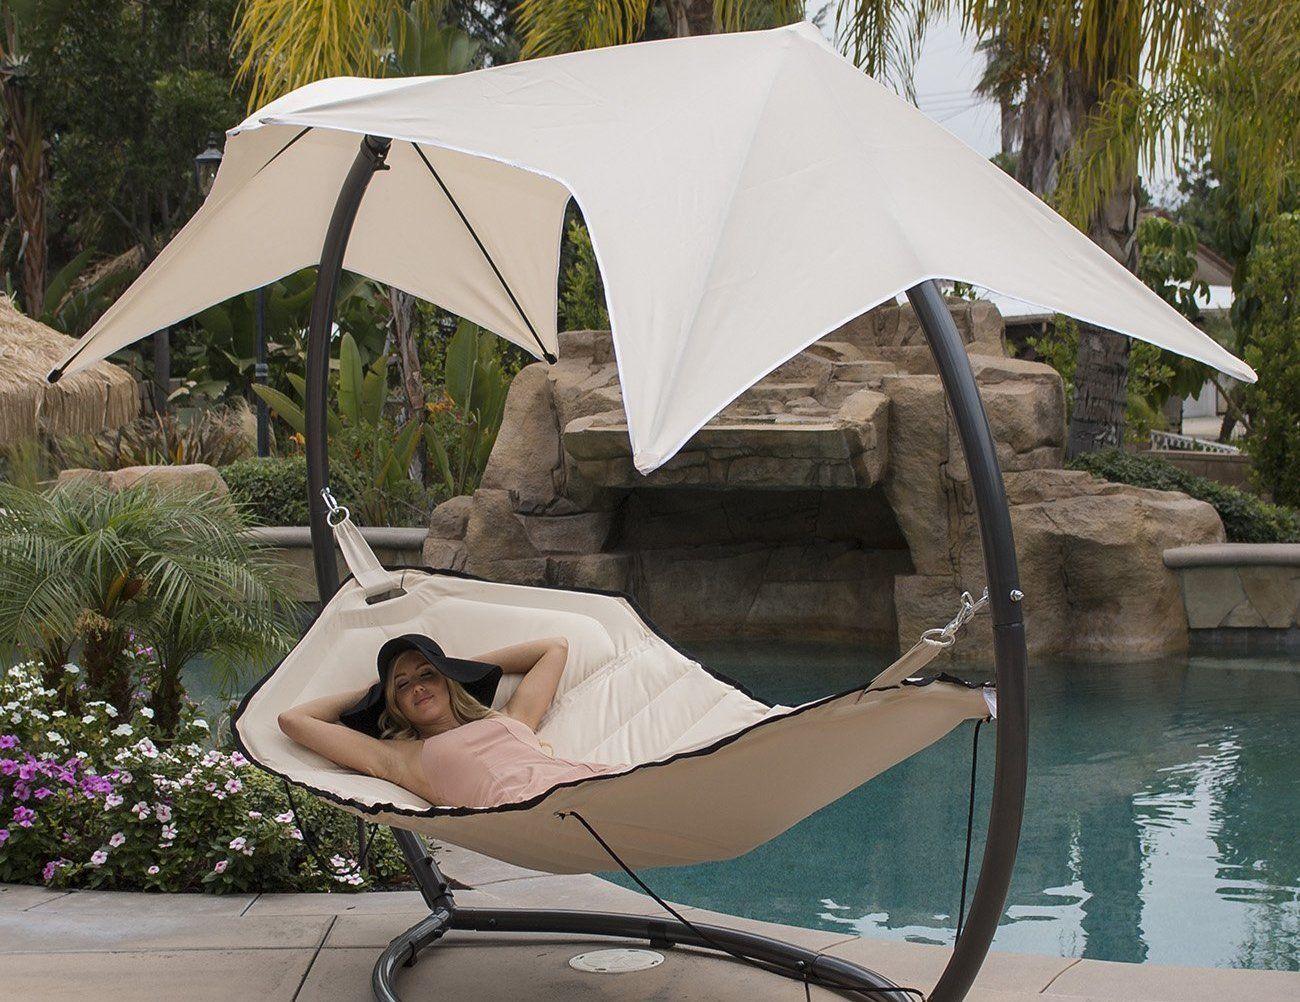 belleze hammock canopy lounger     belleze hammock canopy lounger    gadget flow  rh   thegadgetflow